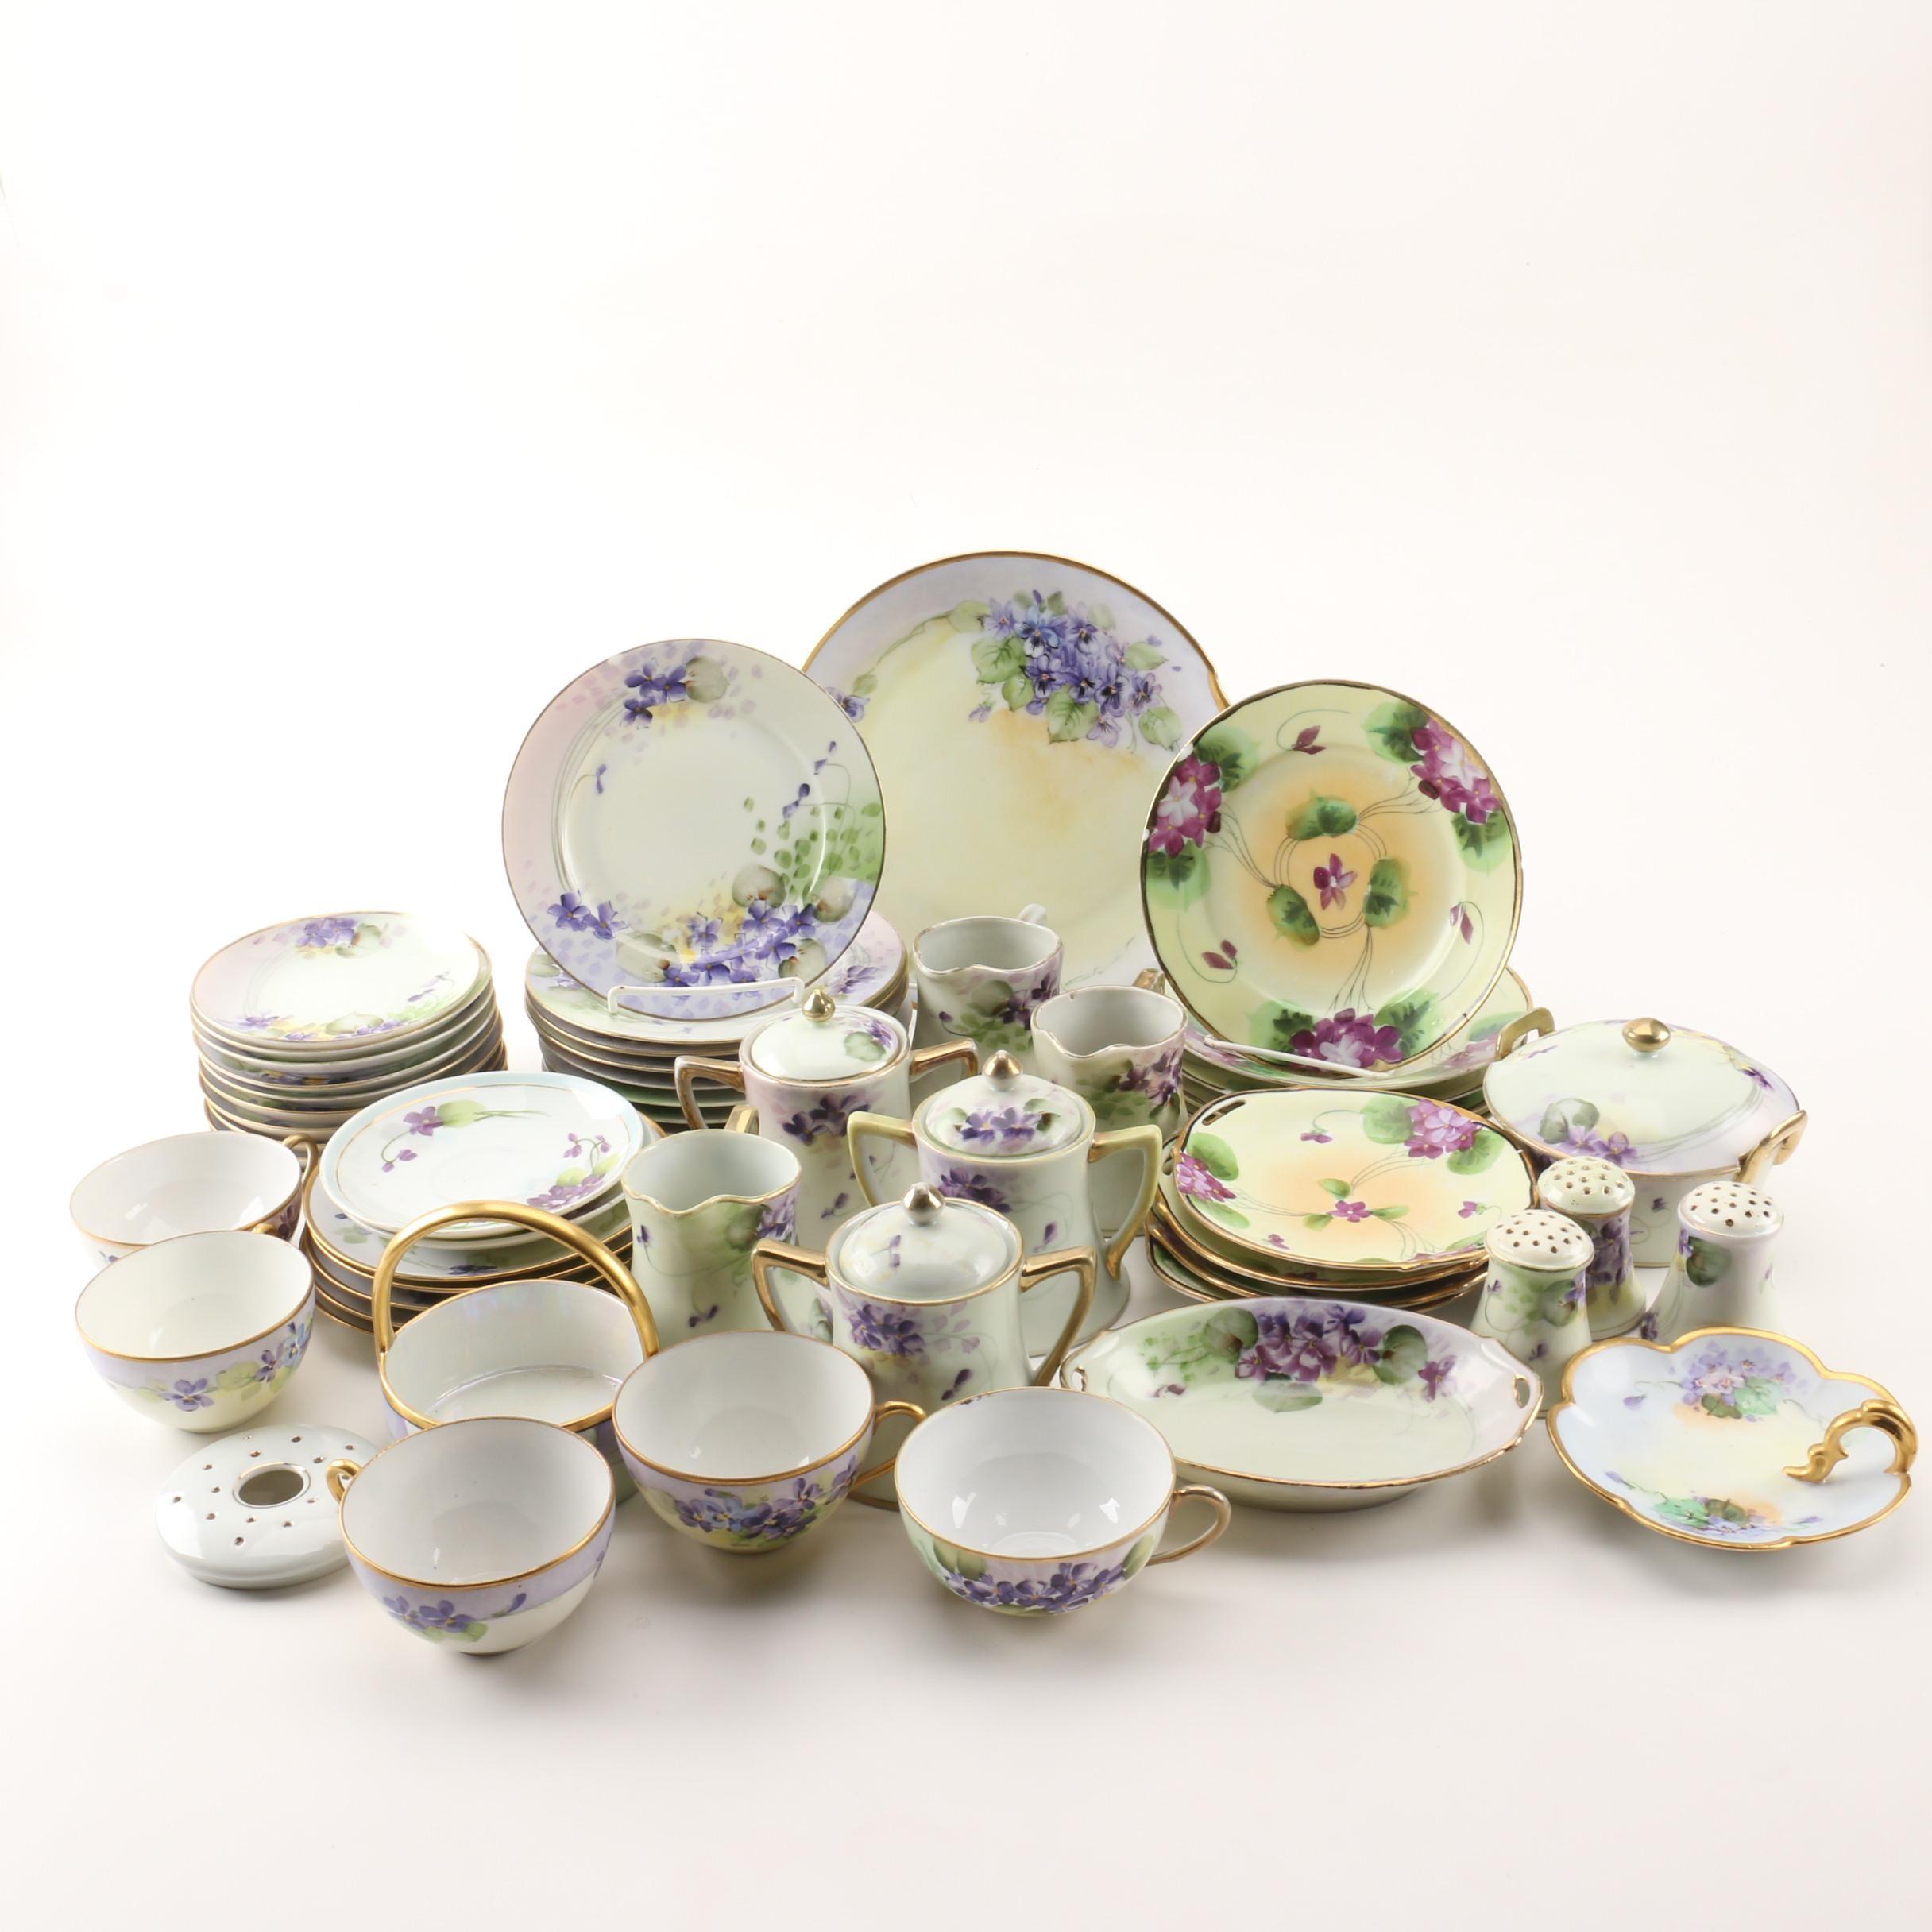 Floral Tableware including antique Moritz Zdekauer